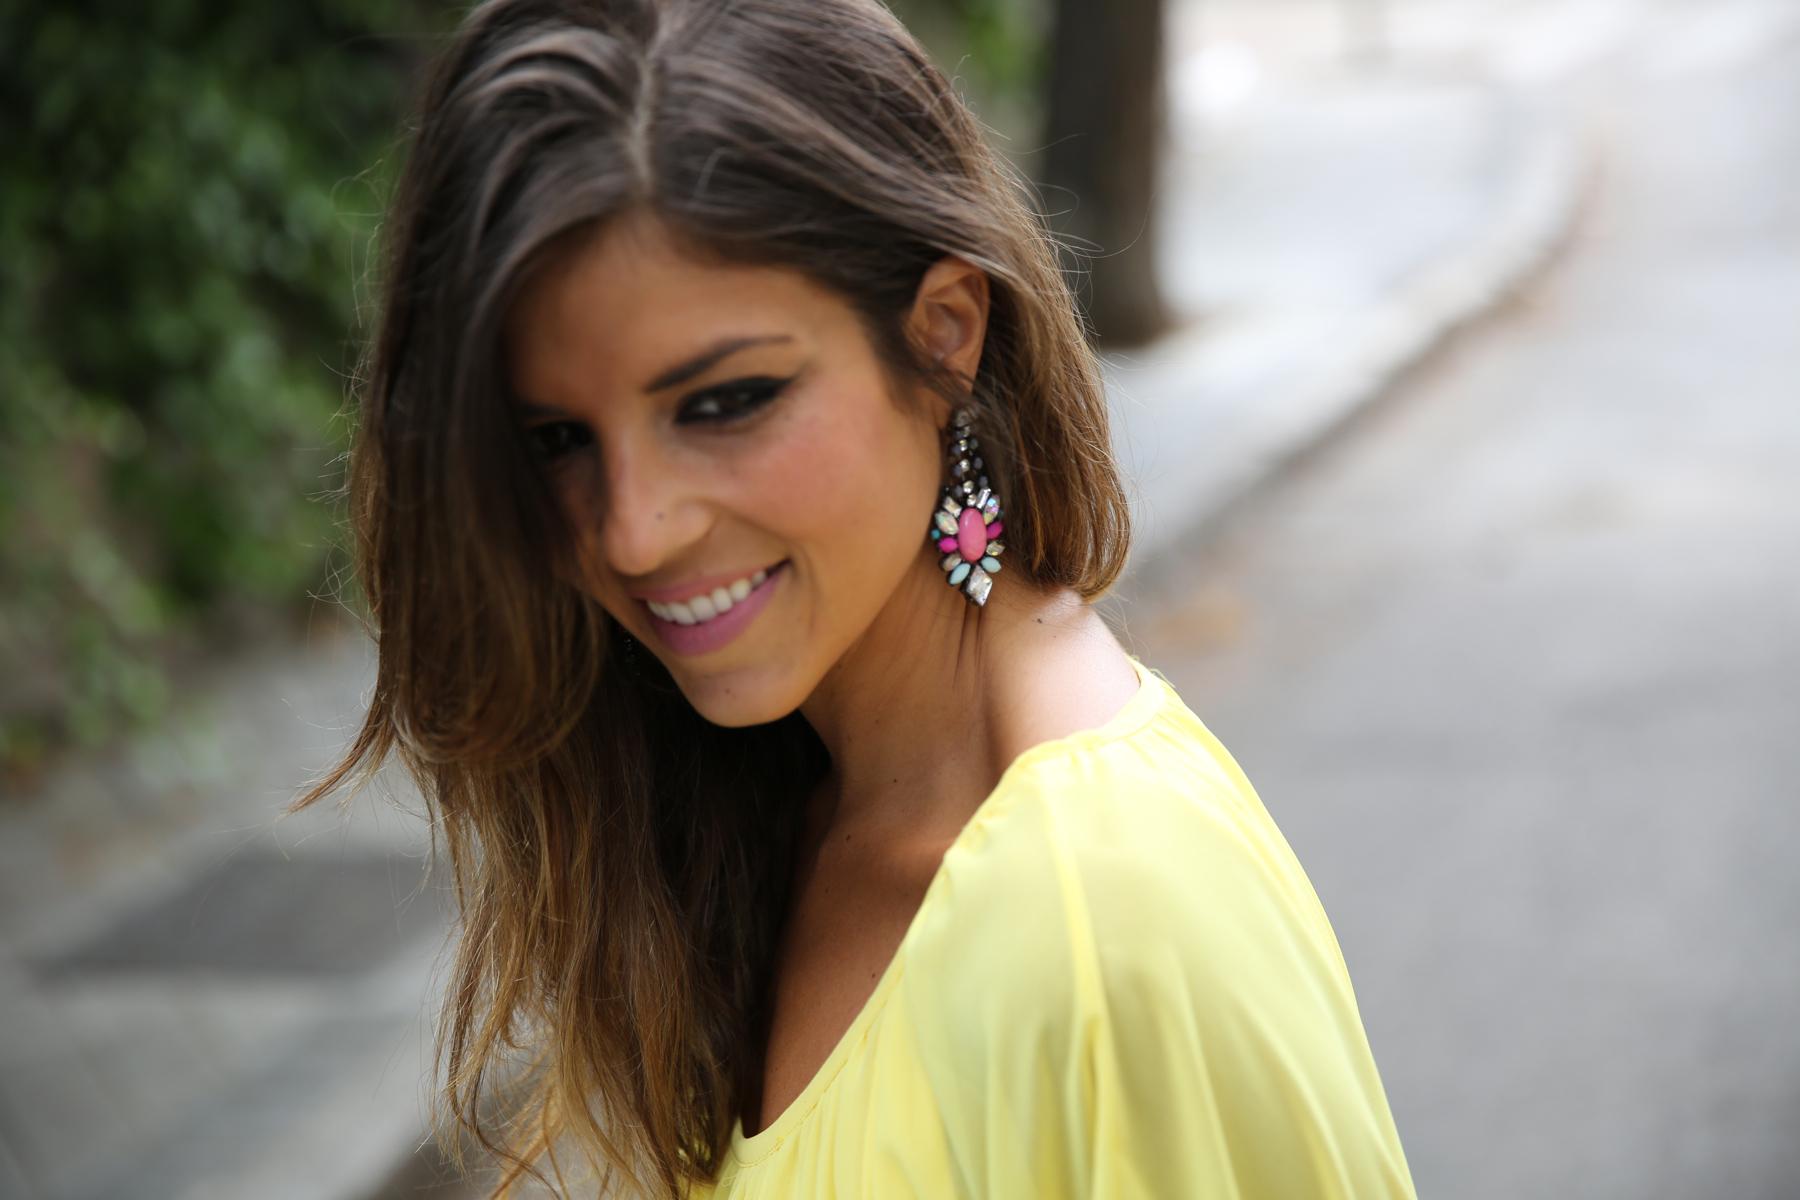 trendy_taste-look-outfit-street_style-ootd-blogger-blog-fashion_spain-moda_españa-yellow_dress-vestido_amarillo-boda-wedding-evento-clutch_pedreria-mas34-sandalias_azules-blue_sandals-3